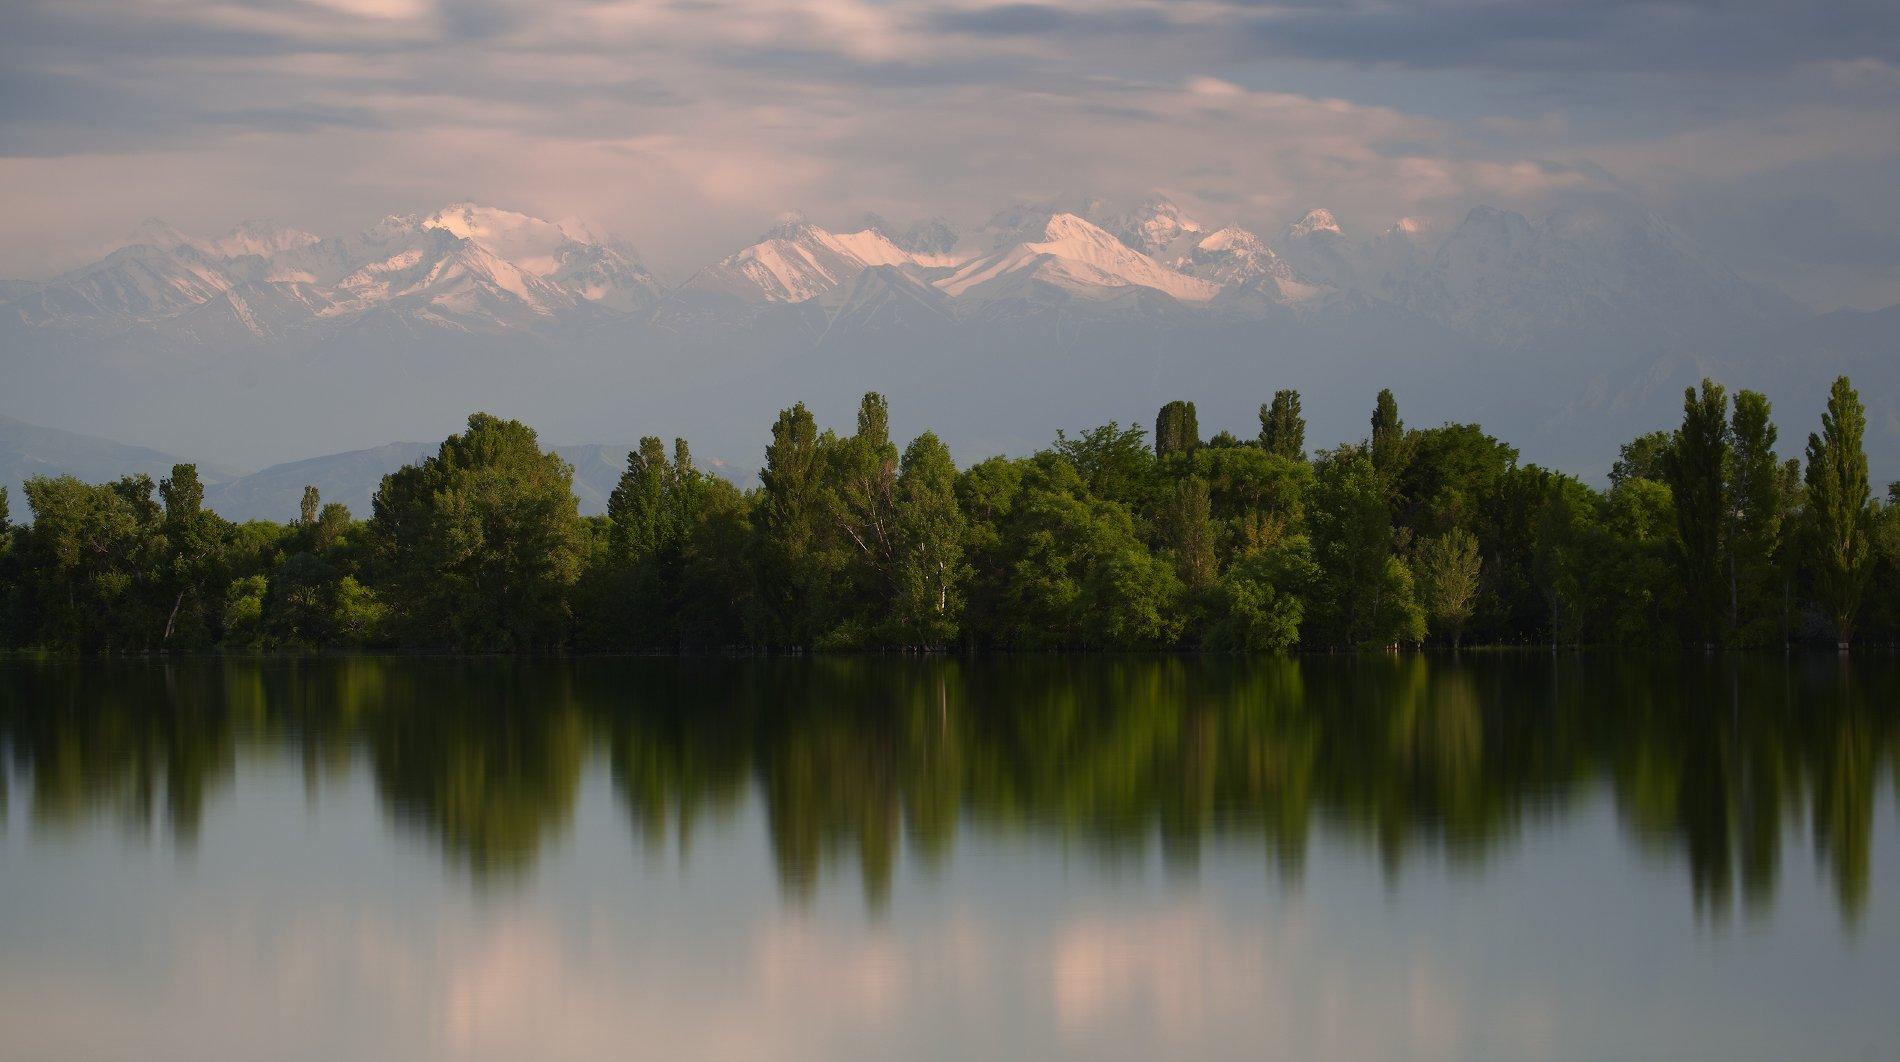 t_berg бишкек ала-арча киргизия горы, Михаил Трахтенберг ( t_berg )